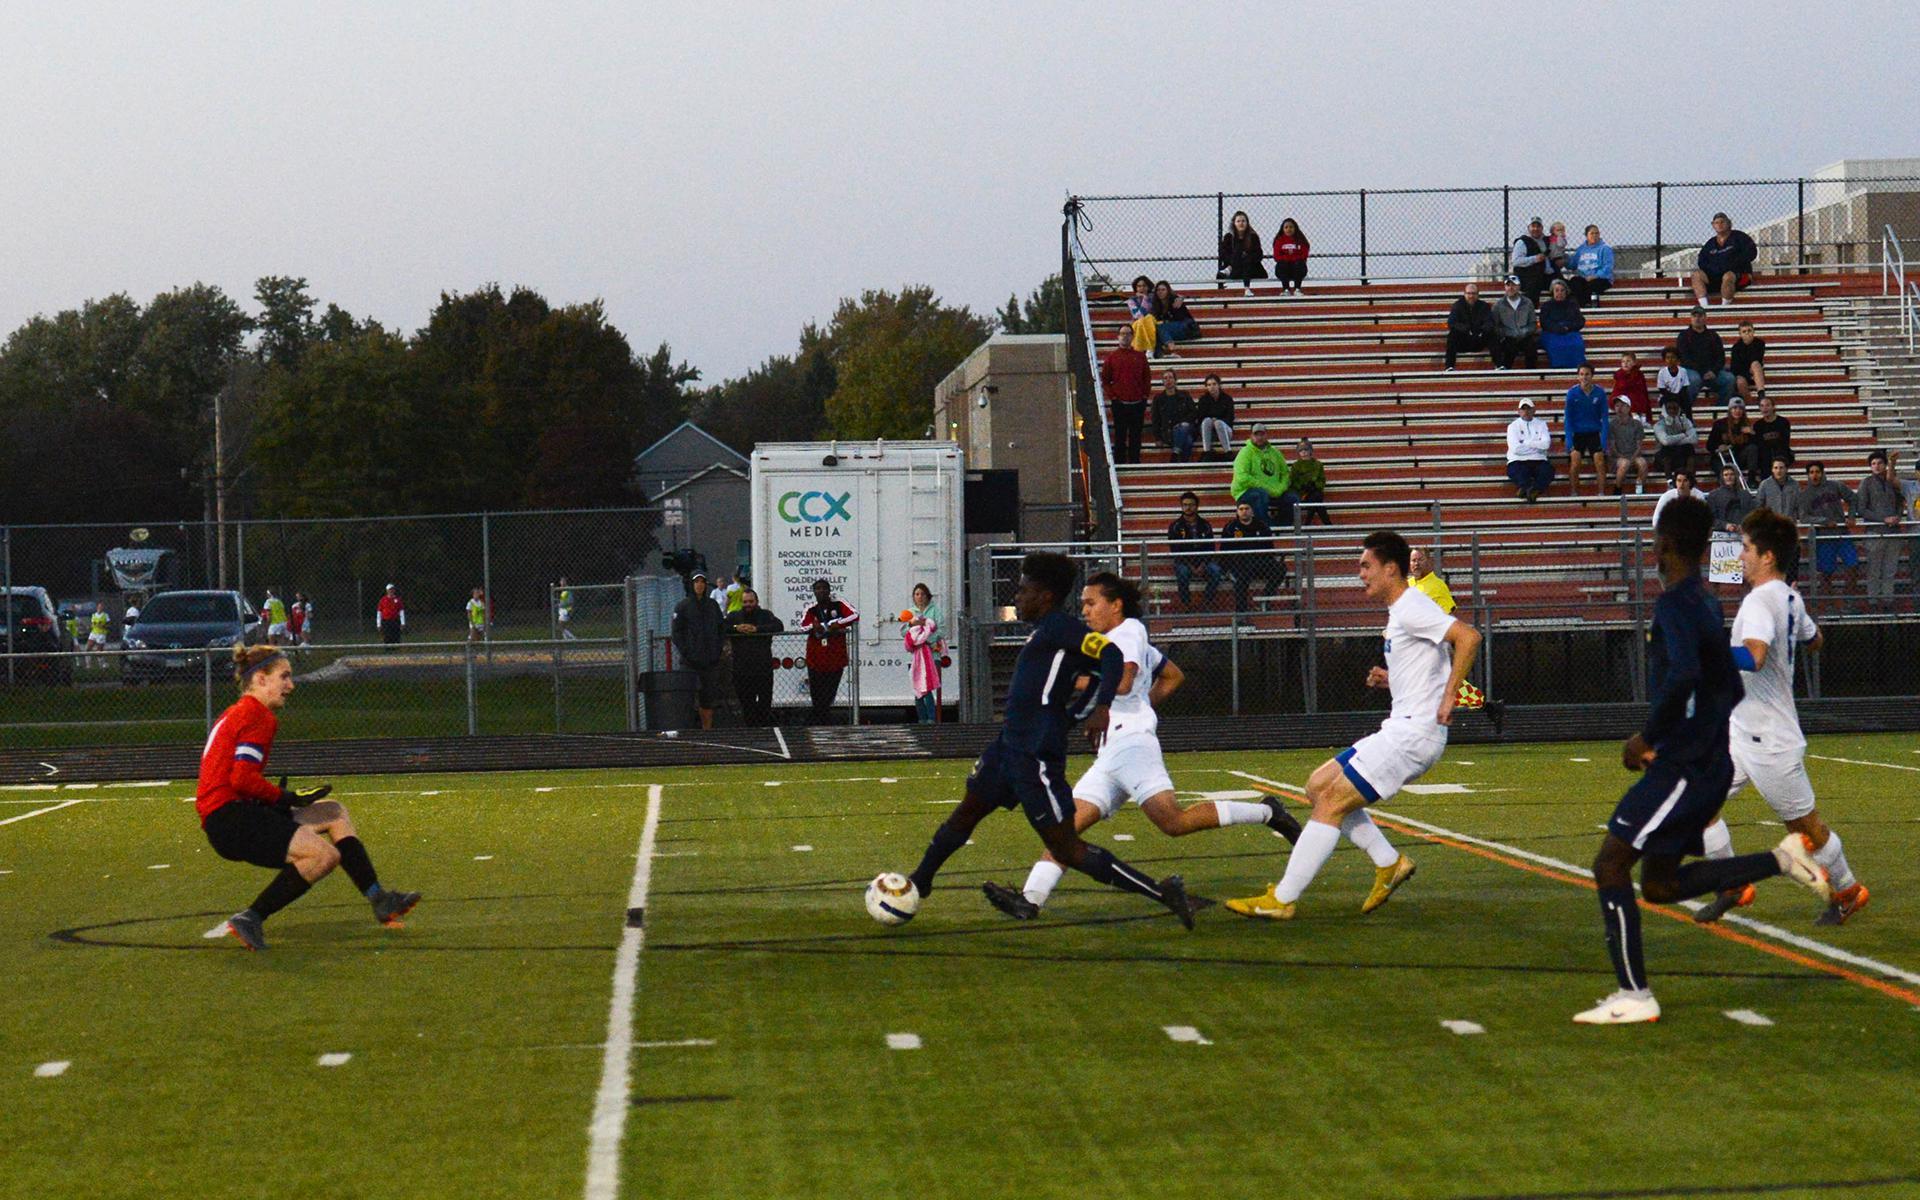 Totino-Grace forward Herbert Endeley makes a late run on goal against Blake. Photo by Carter Jones, SportsEngine